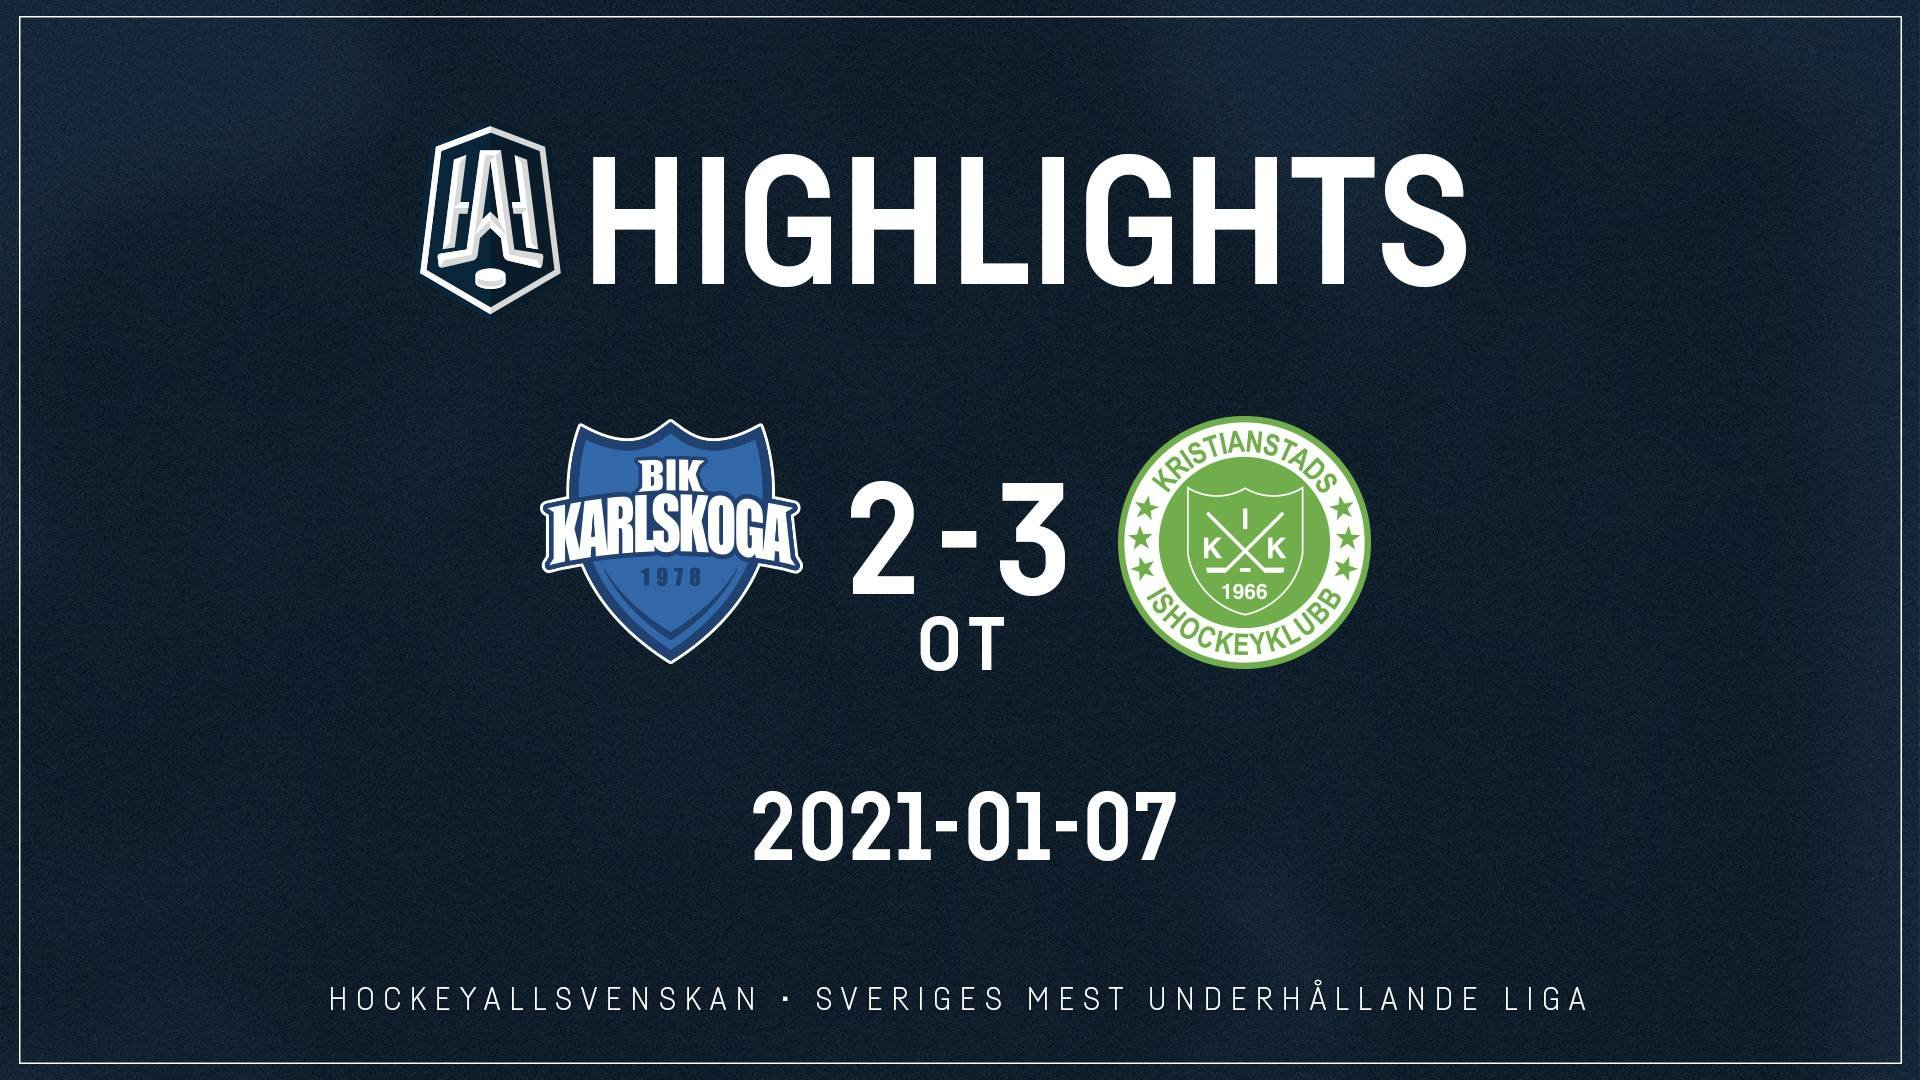 2021-01-07 Karlskoga - Kristianstad 2-3 (OT)